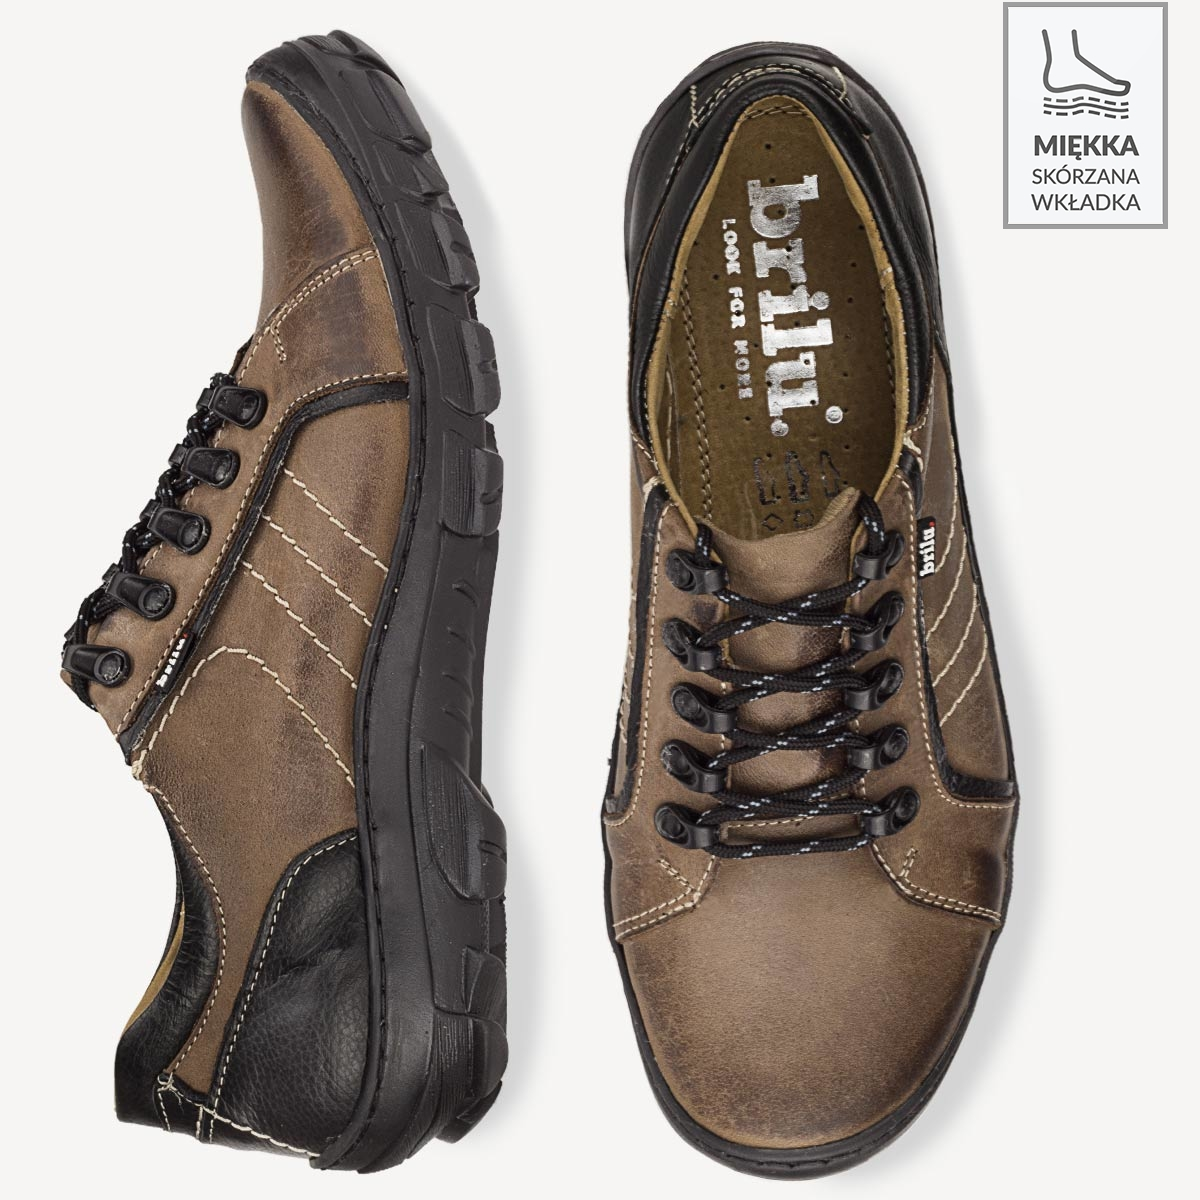 Buty trekkingowe skórzane Hektor brązowe